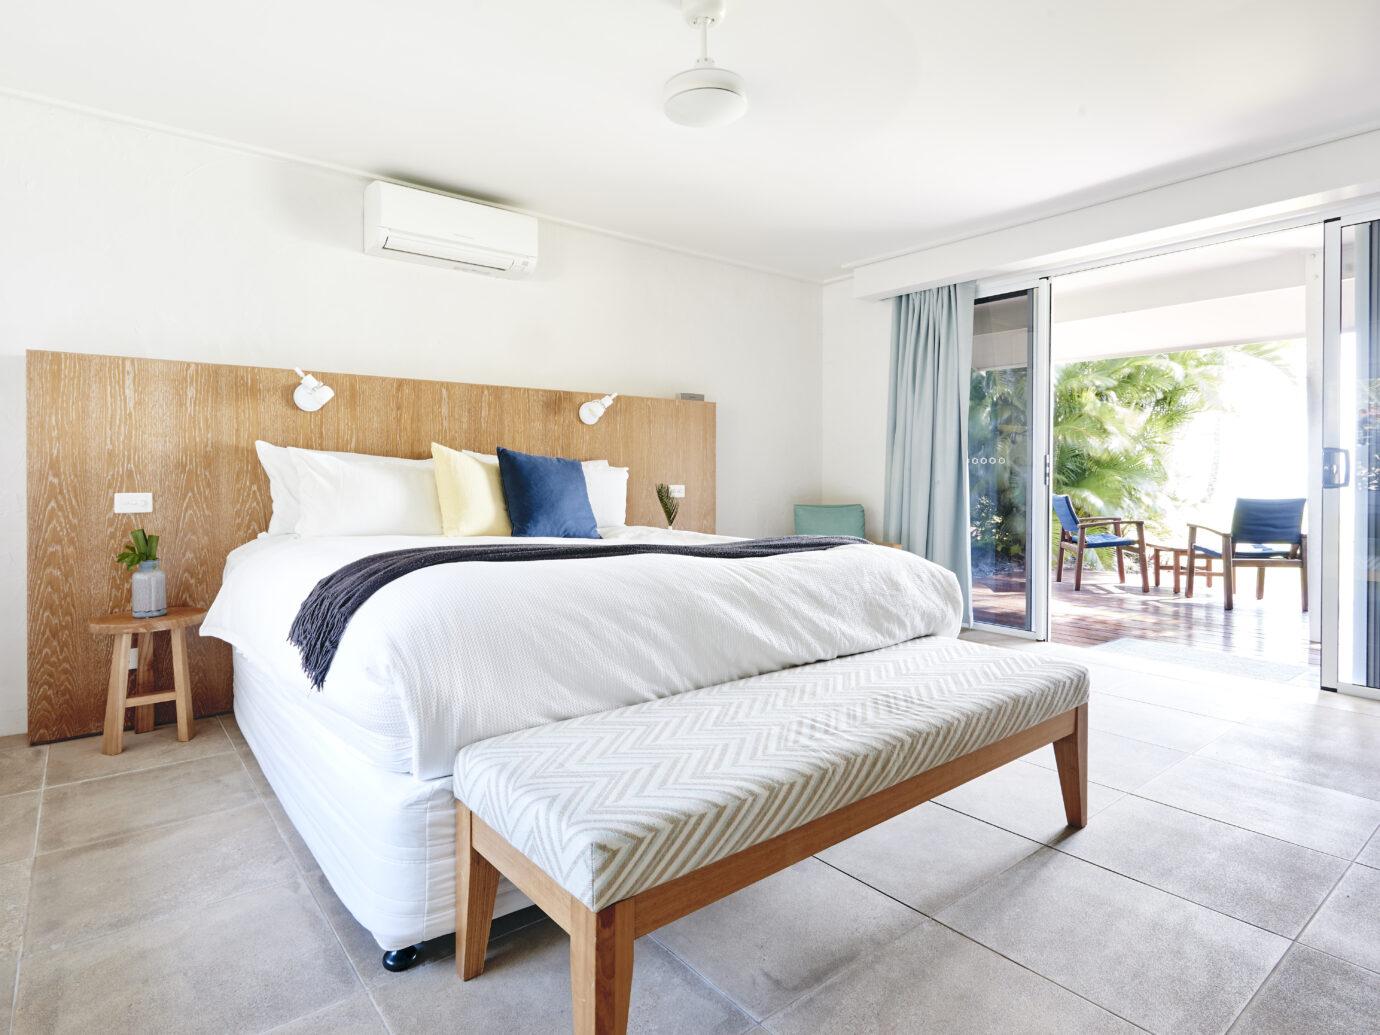 Bedroom at Orpheus Island